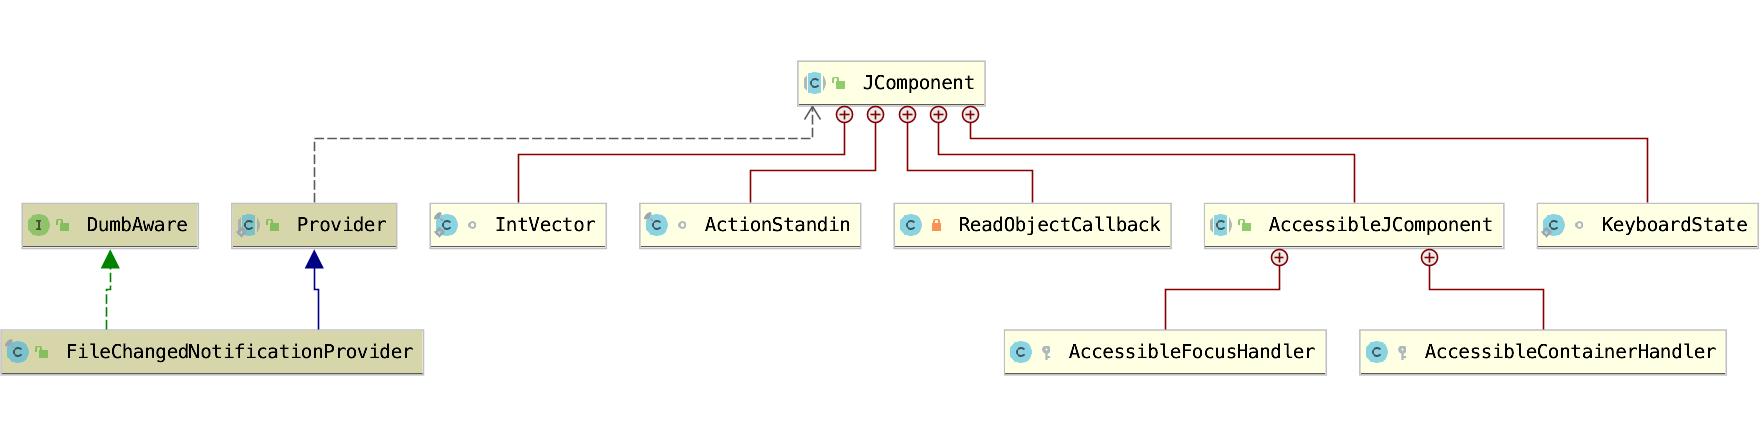 Class diagram toolbar, context menu, and legend - Help ...